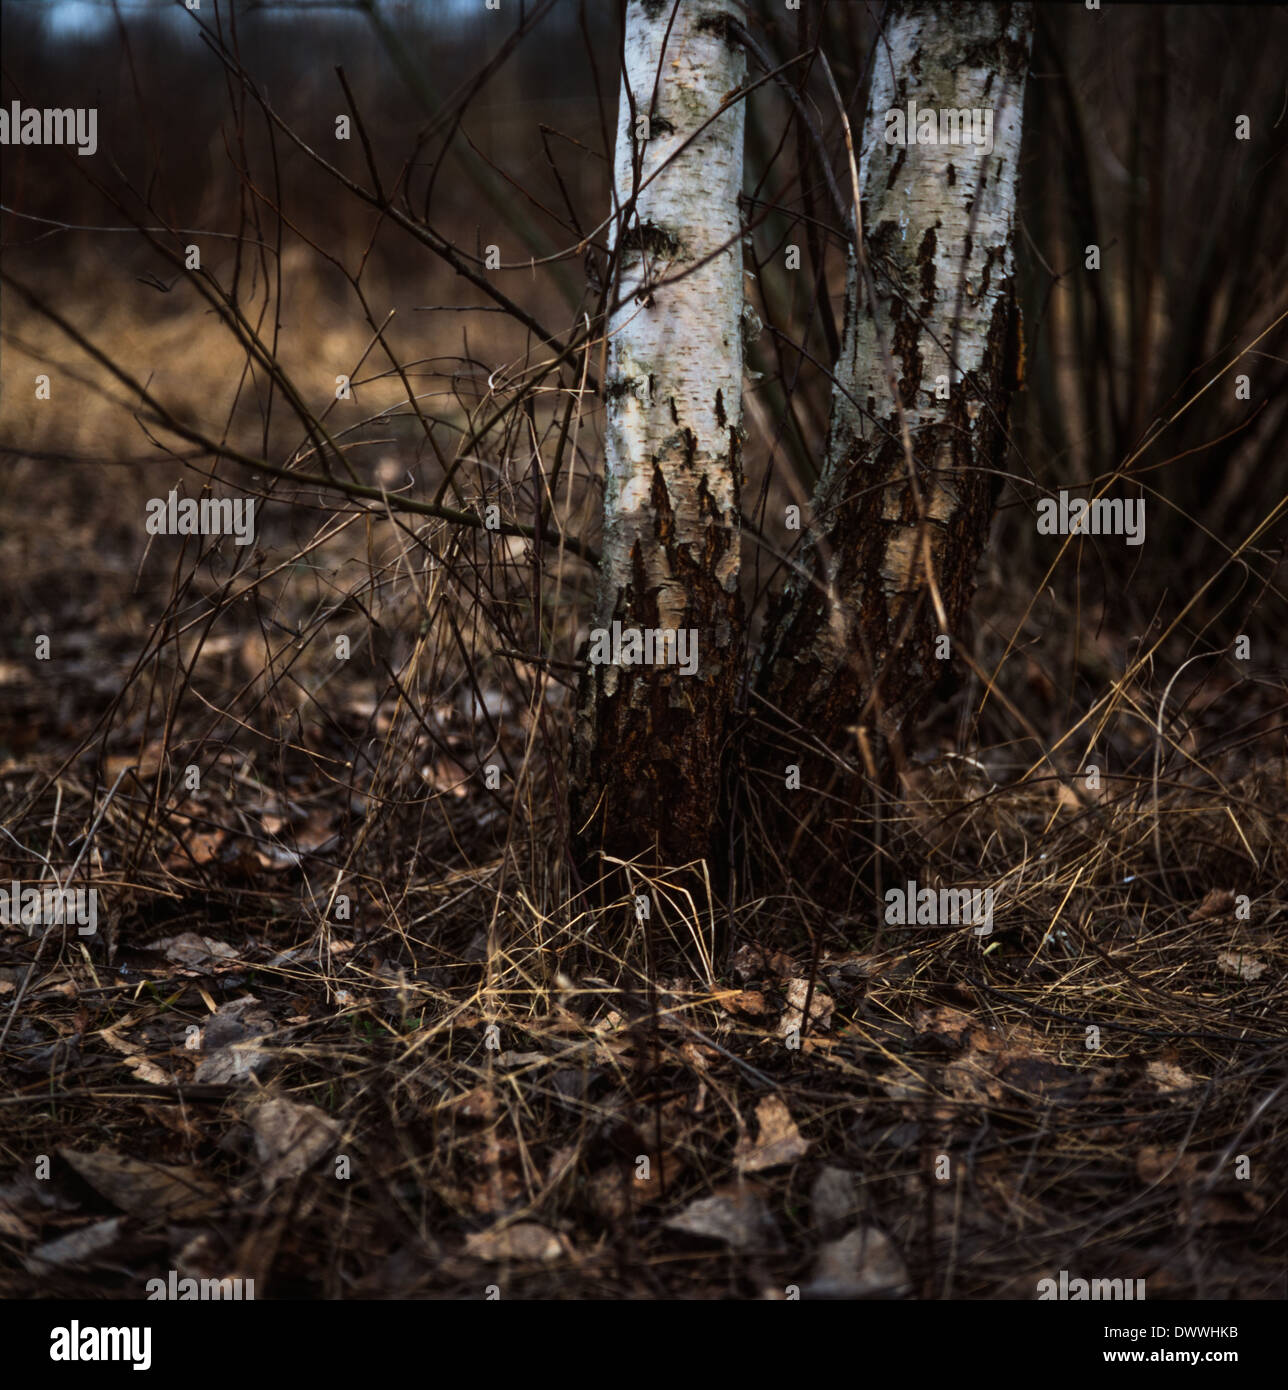 Birch trees taken on medium format film - Stock Image